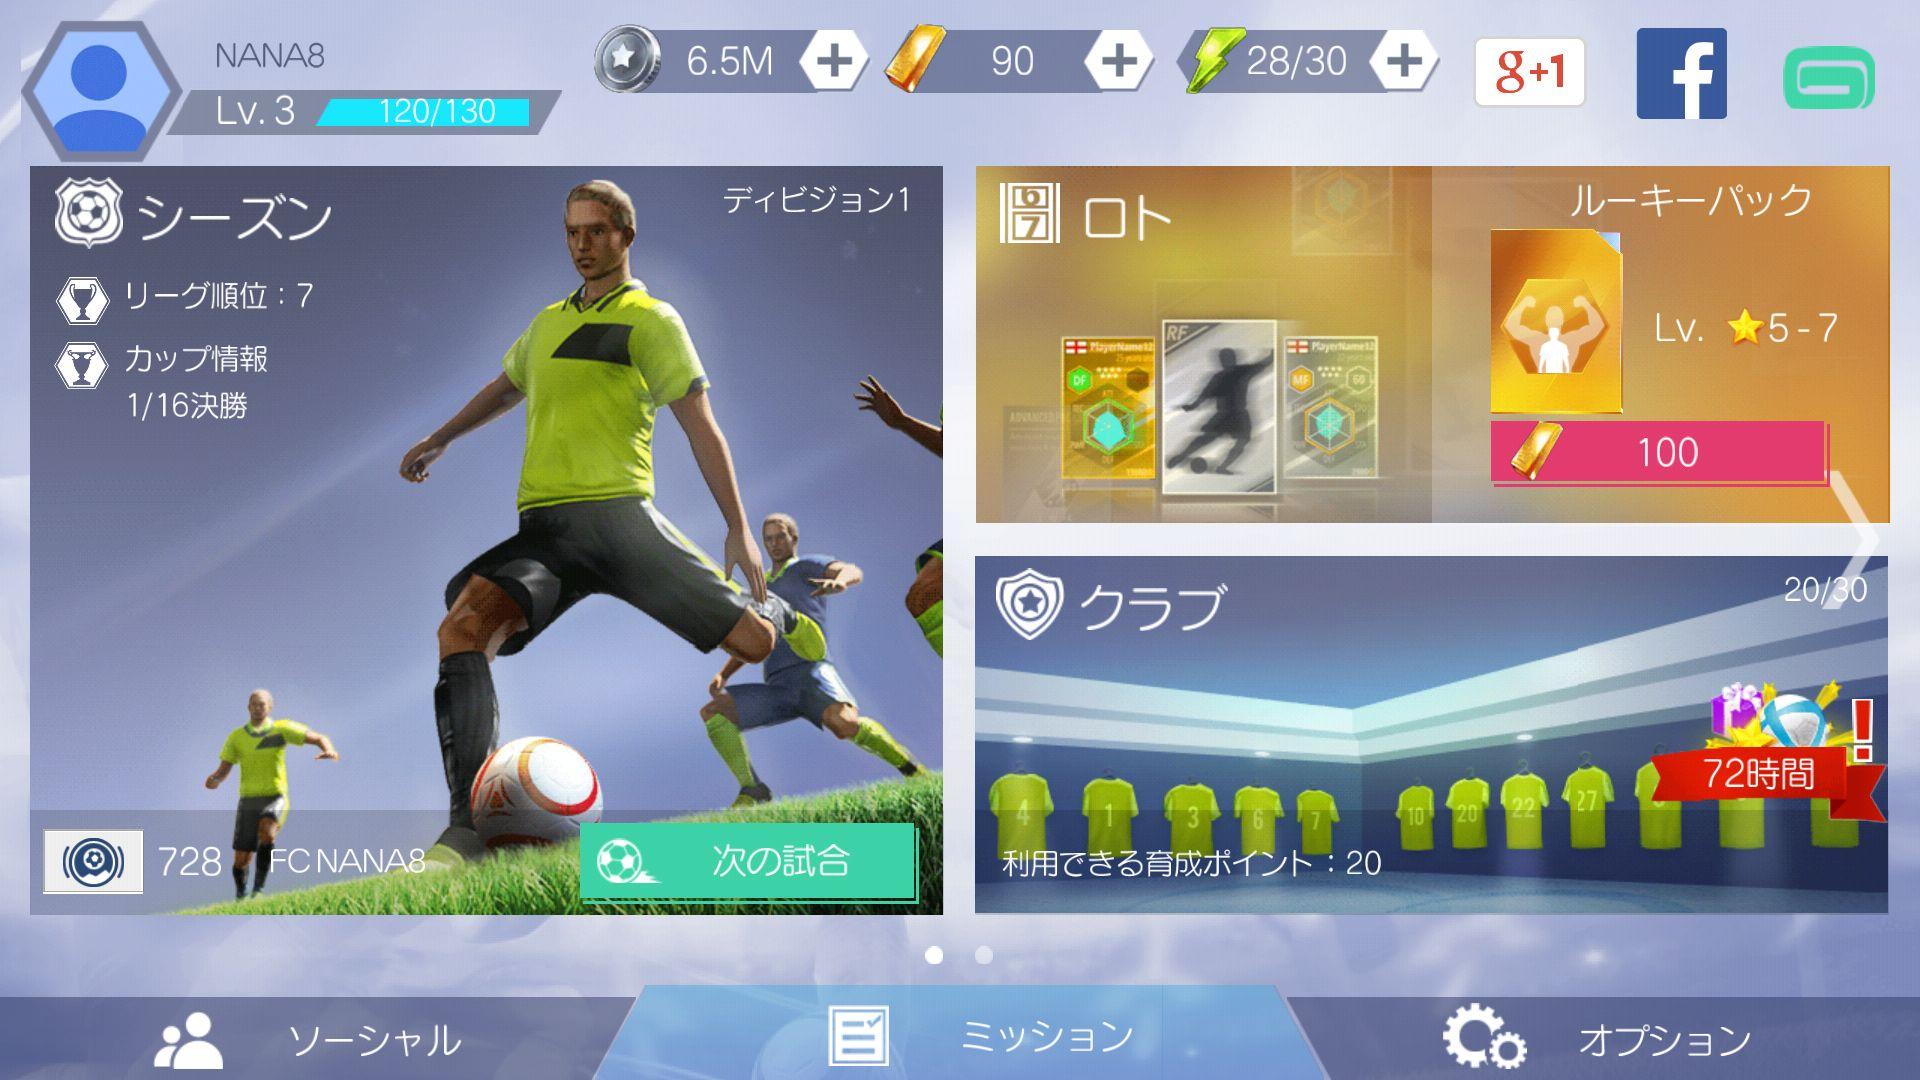 androidアプリ リアルサッカー攻略スクリーンショット1